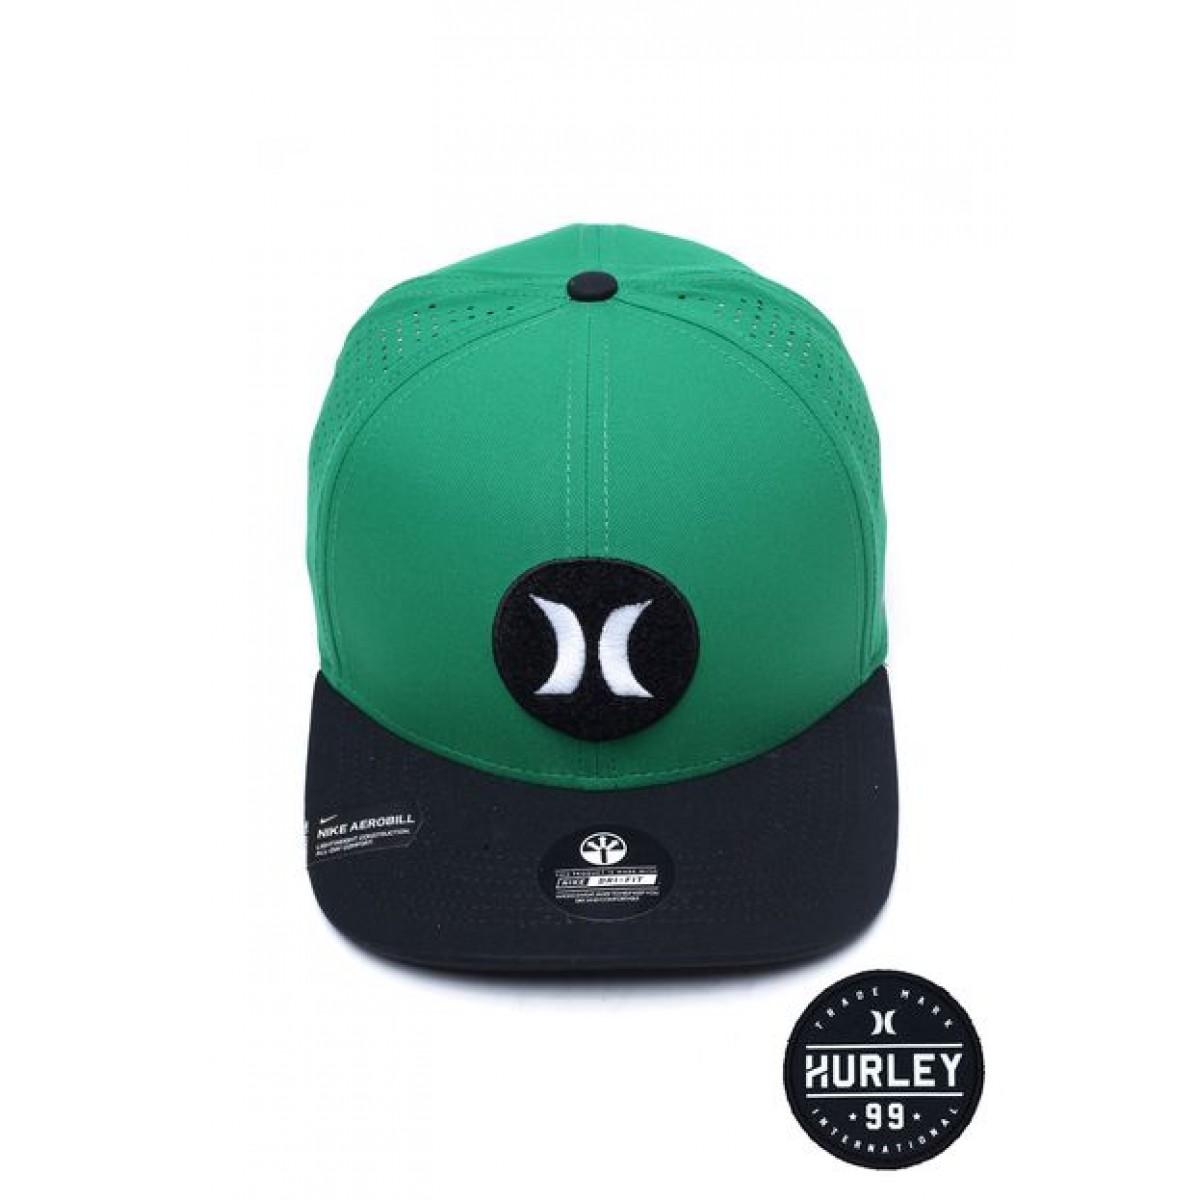 Boné Masculino Hurley Dri Fit Thirdeyes Verde - Compre Aqui  be0168703e9